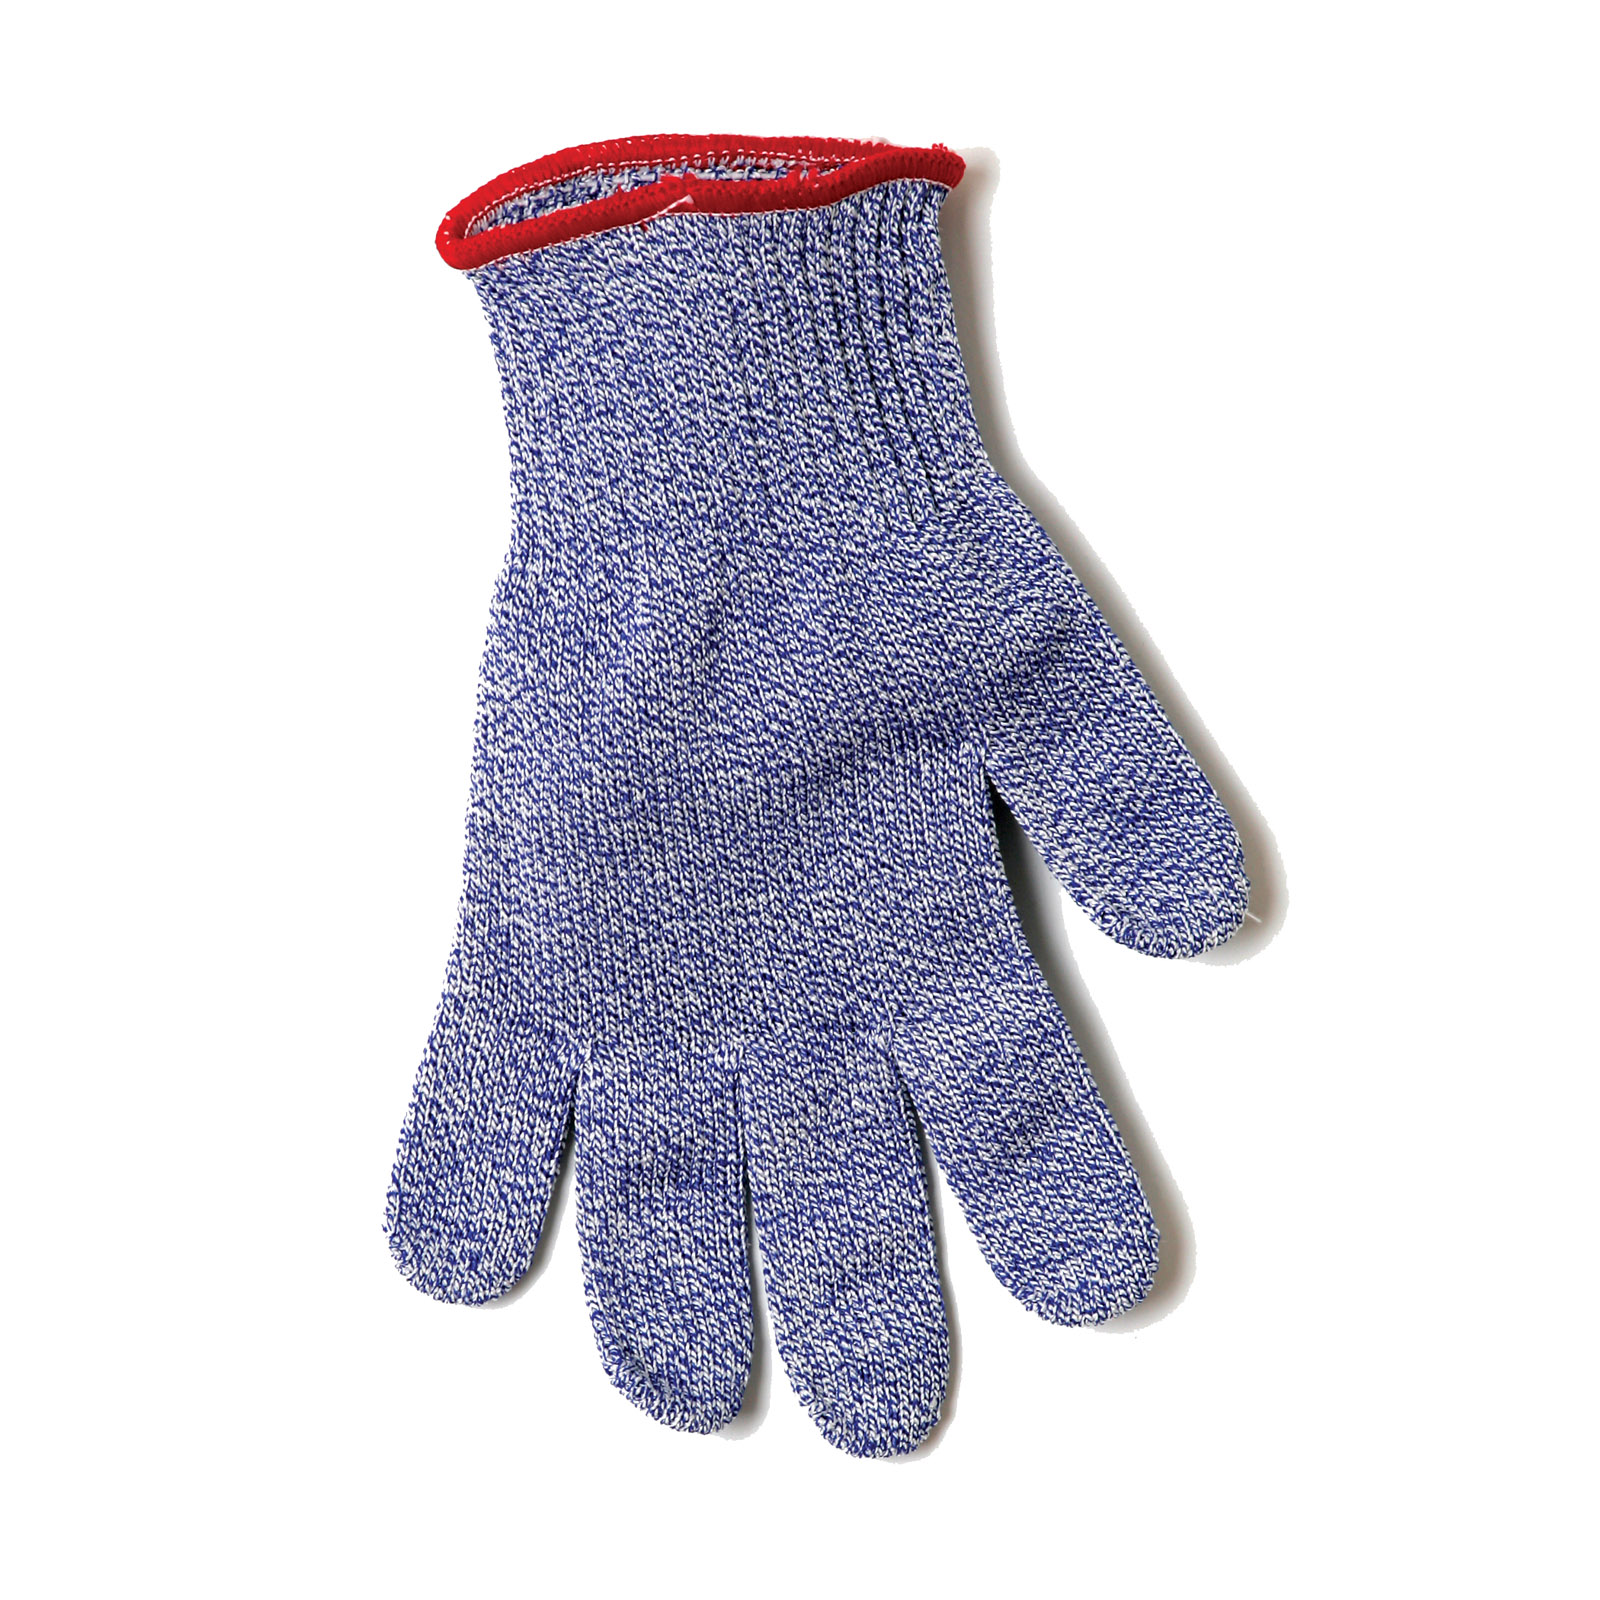 San Jamar SG10-BL-L glove, cut resistant